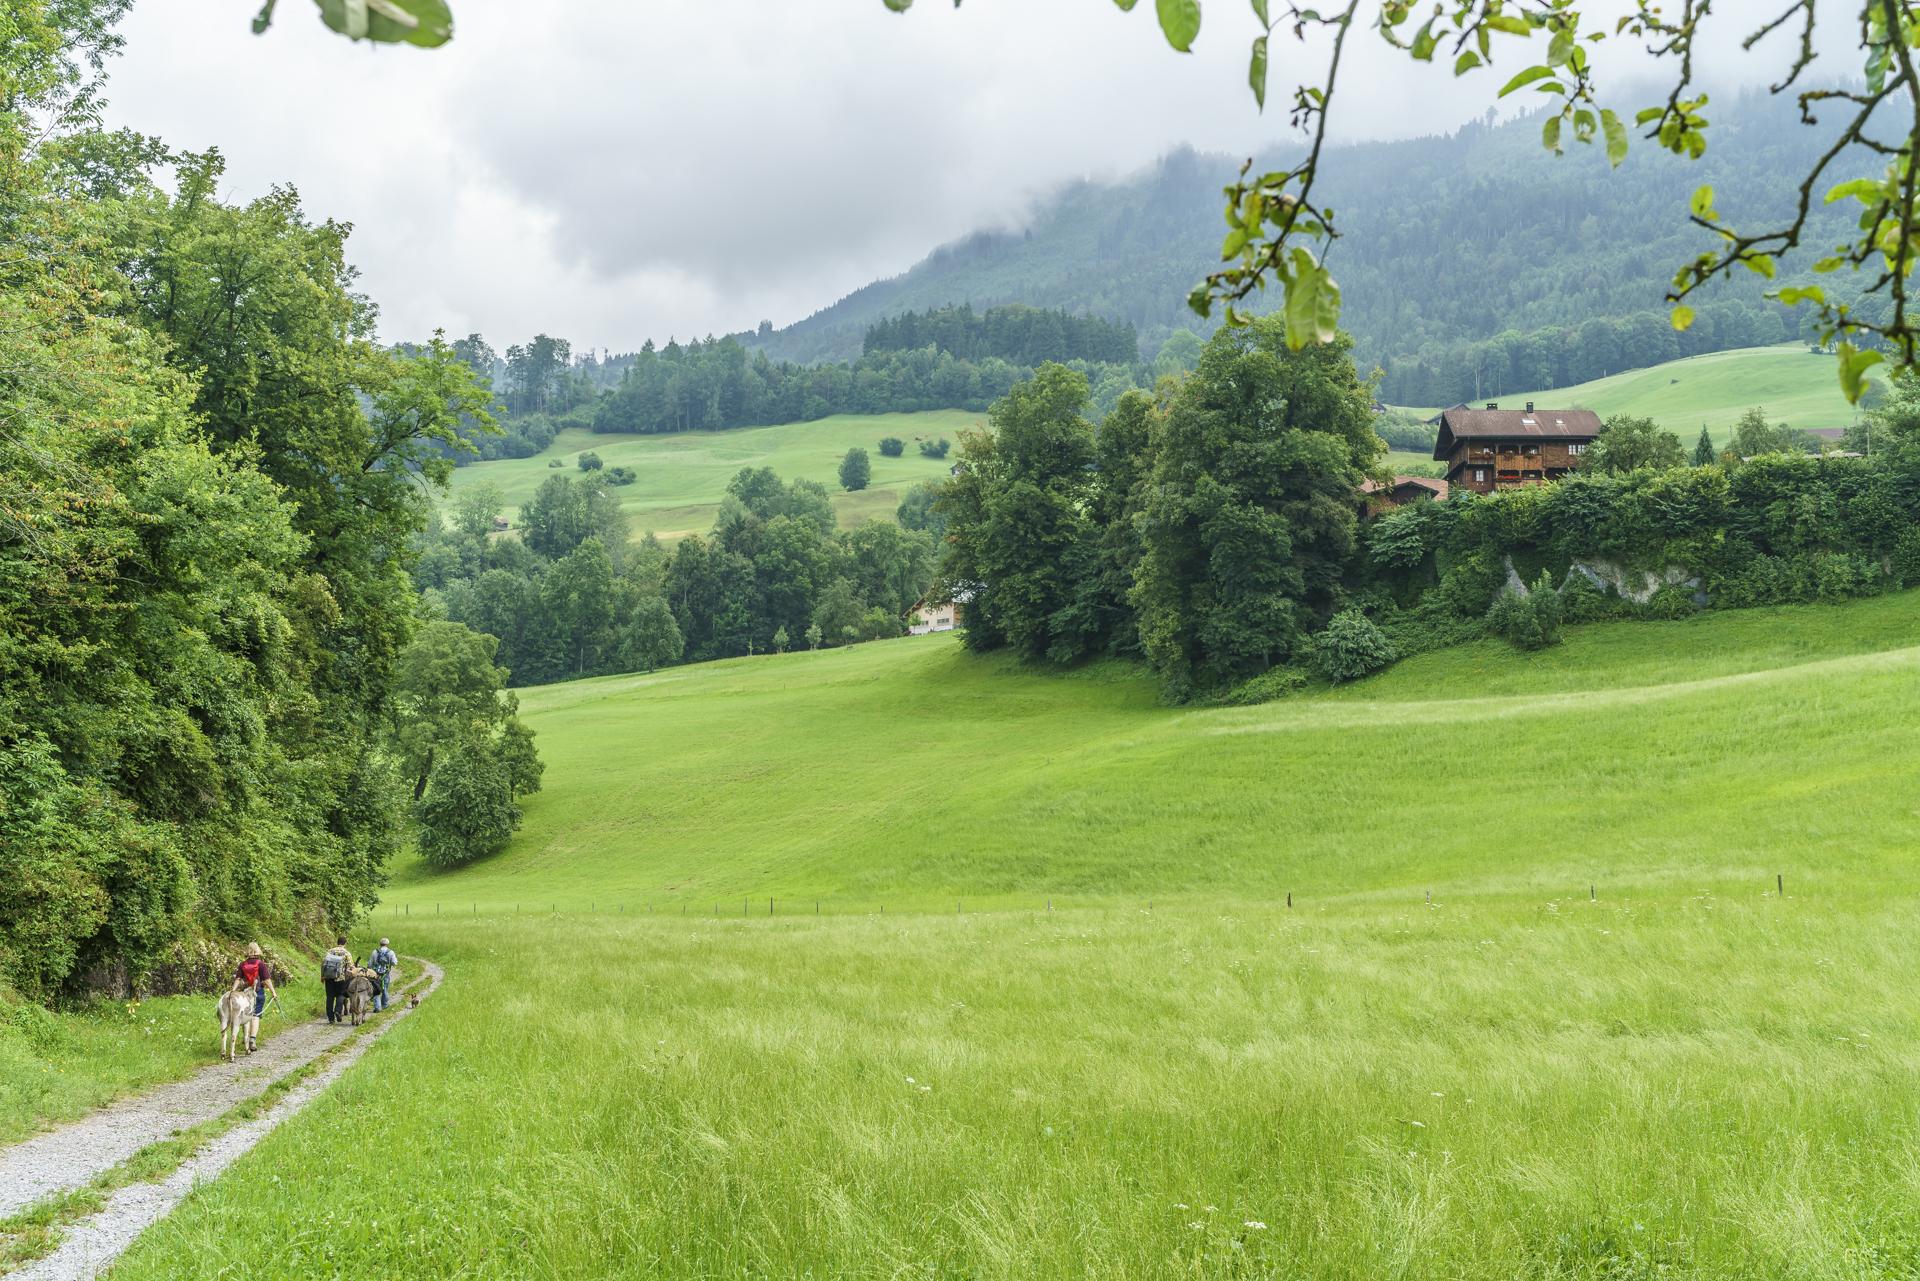 Eseltrekking-Schweiz-Obwalden